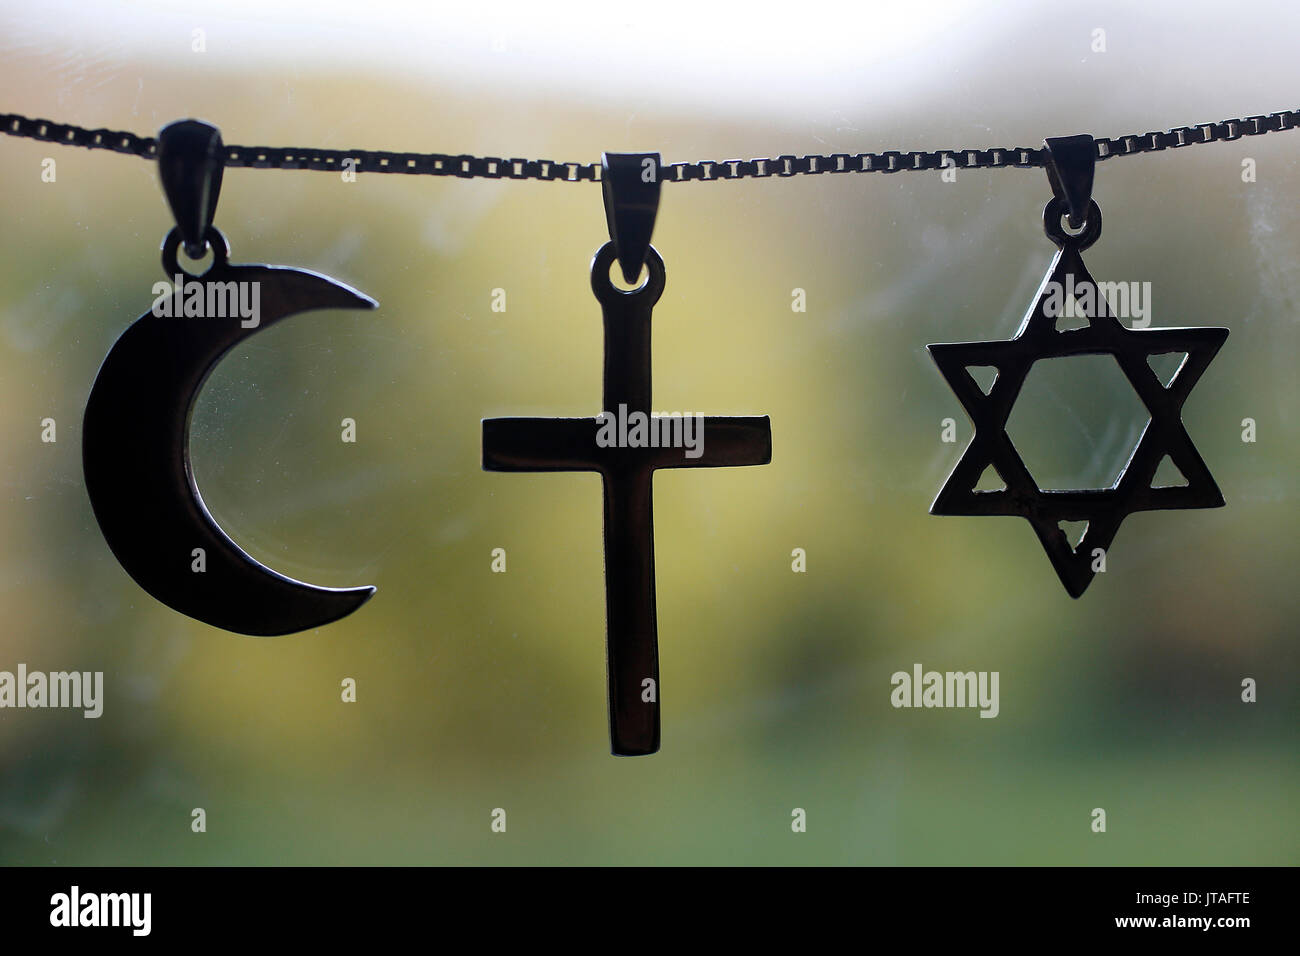 Symbols of Islam, Christianity and Judaism, Eure, France, Europe - Stock Image